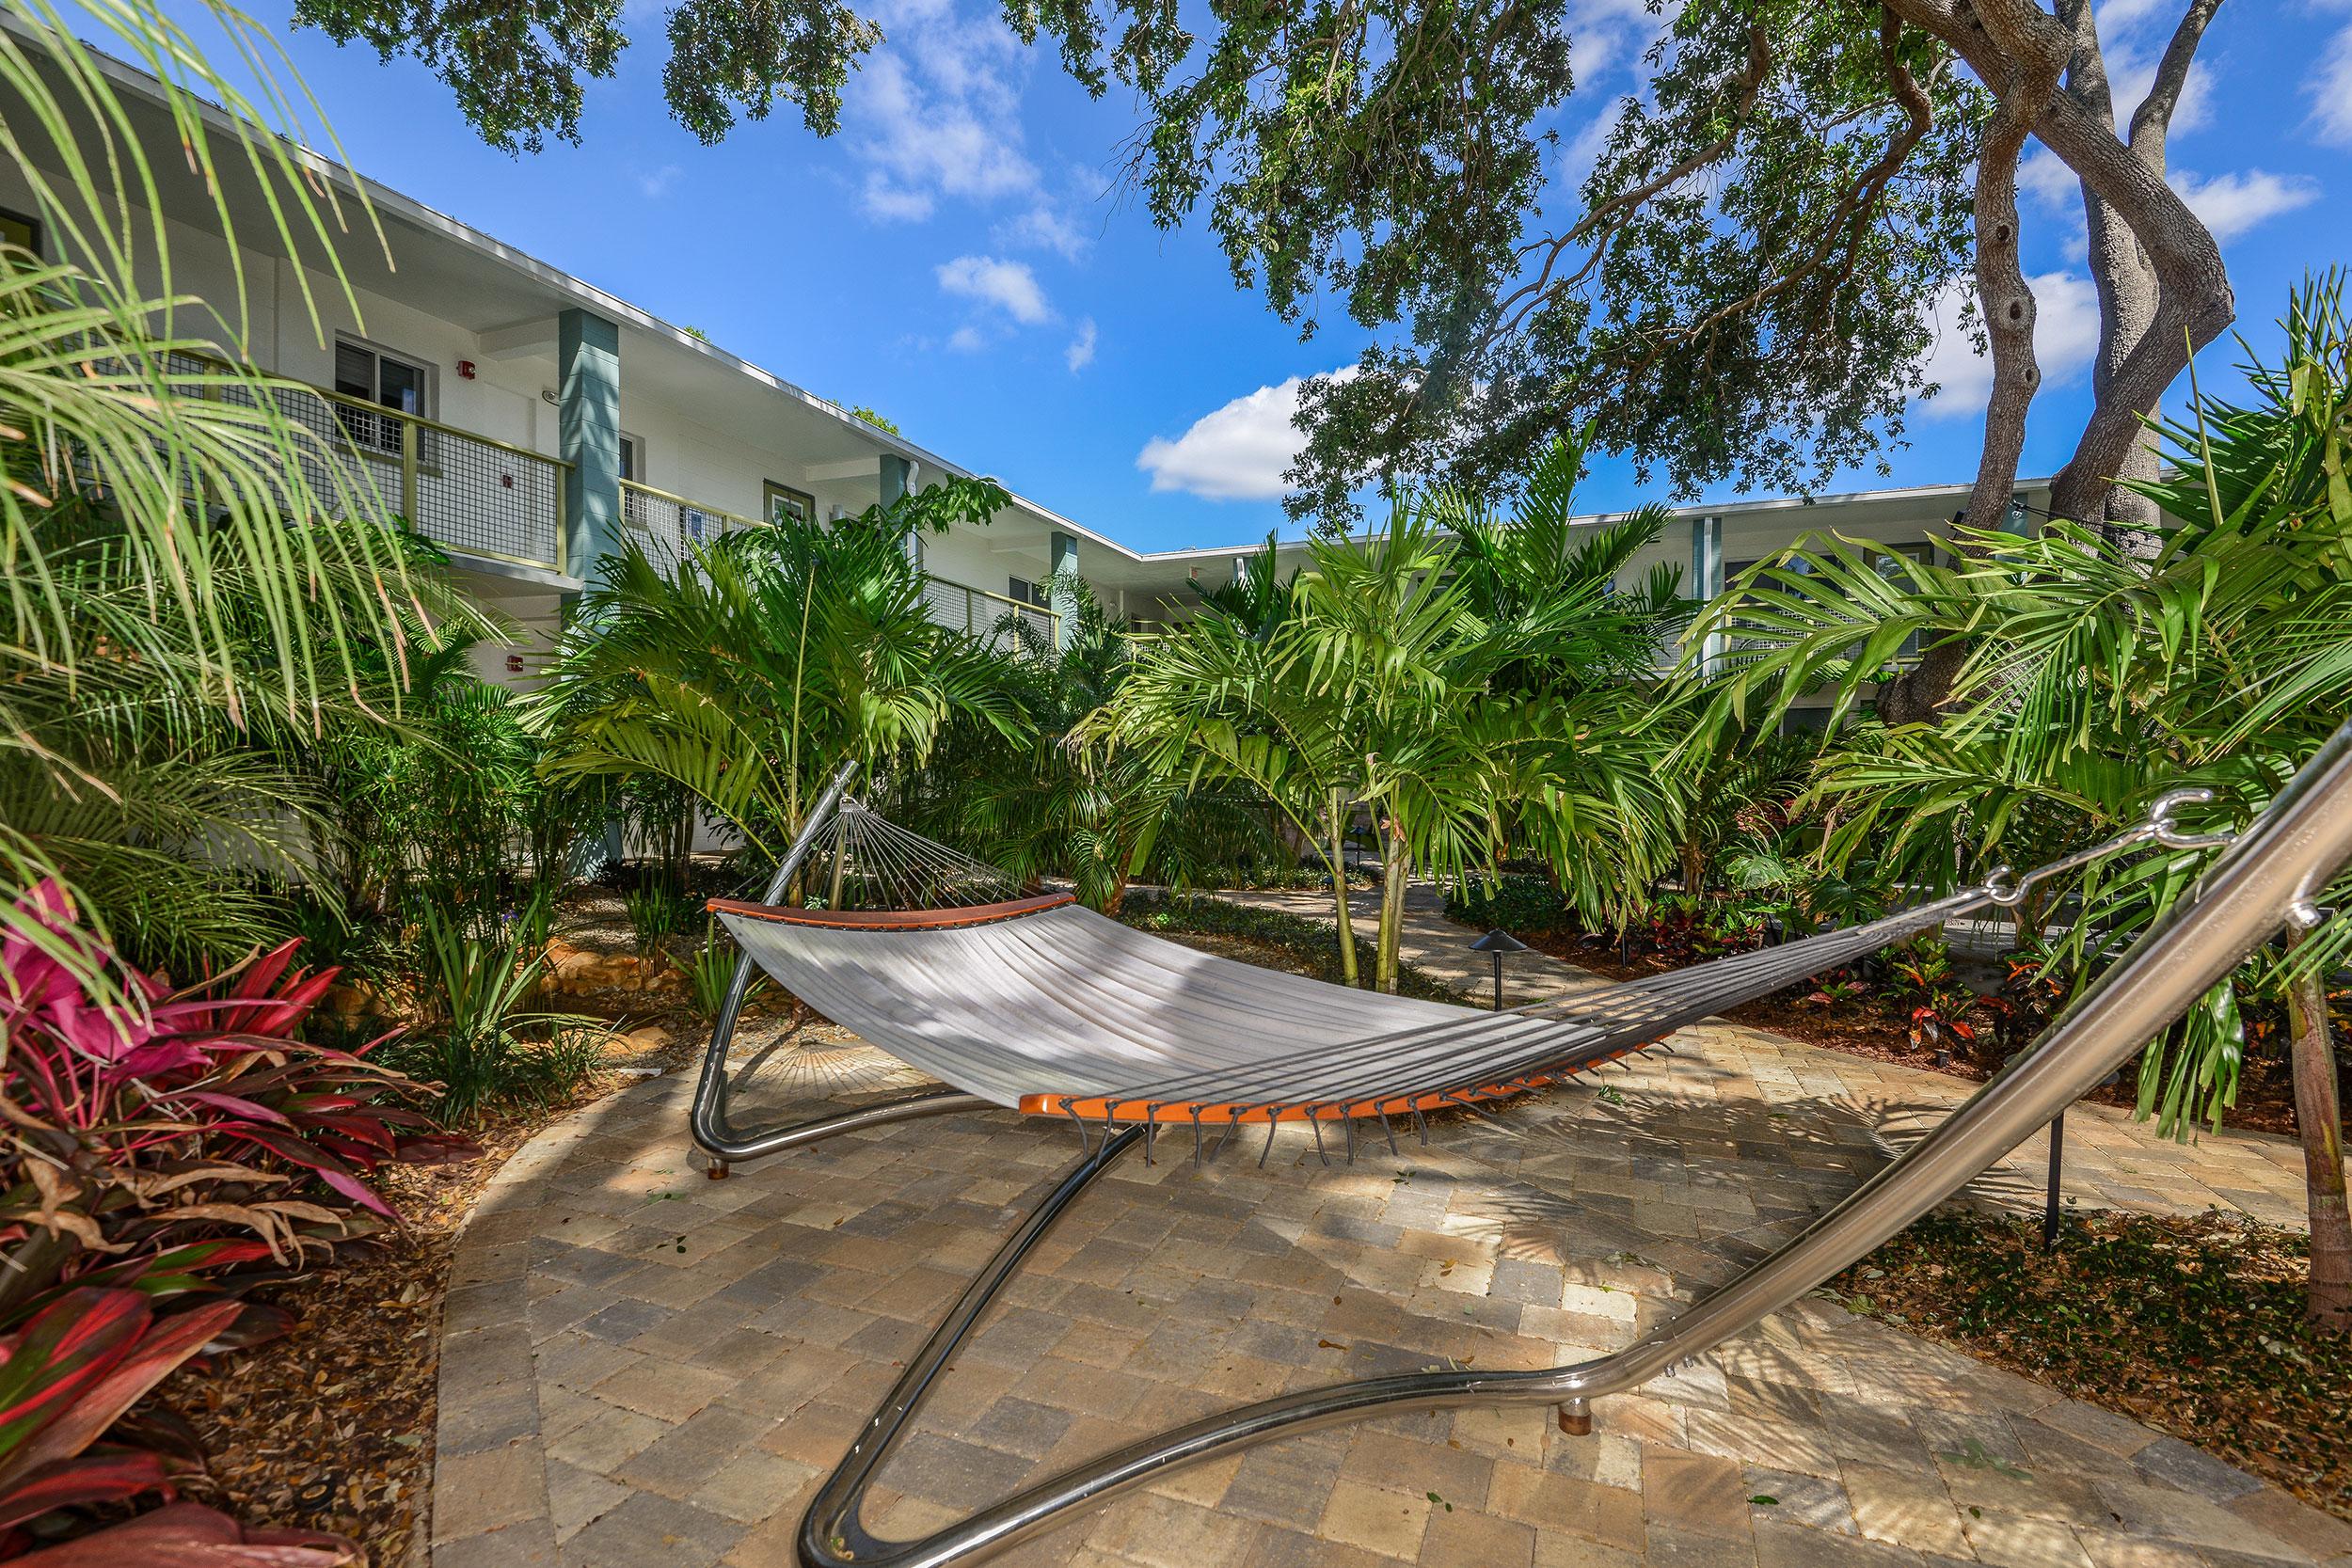 Bsf-amen-hammock